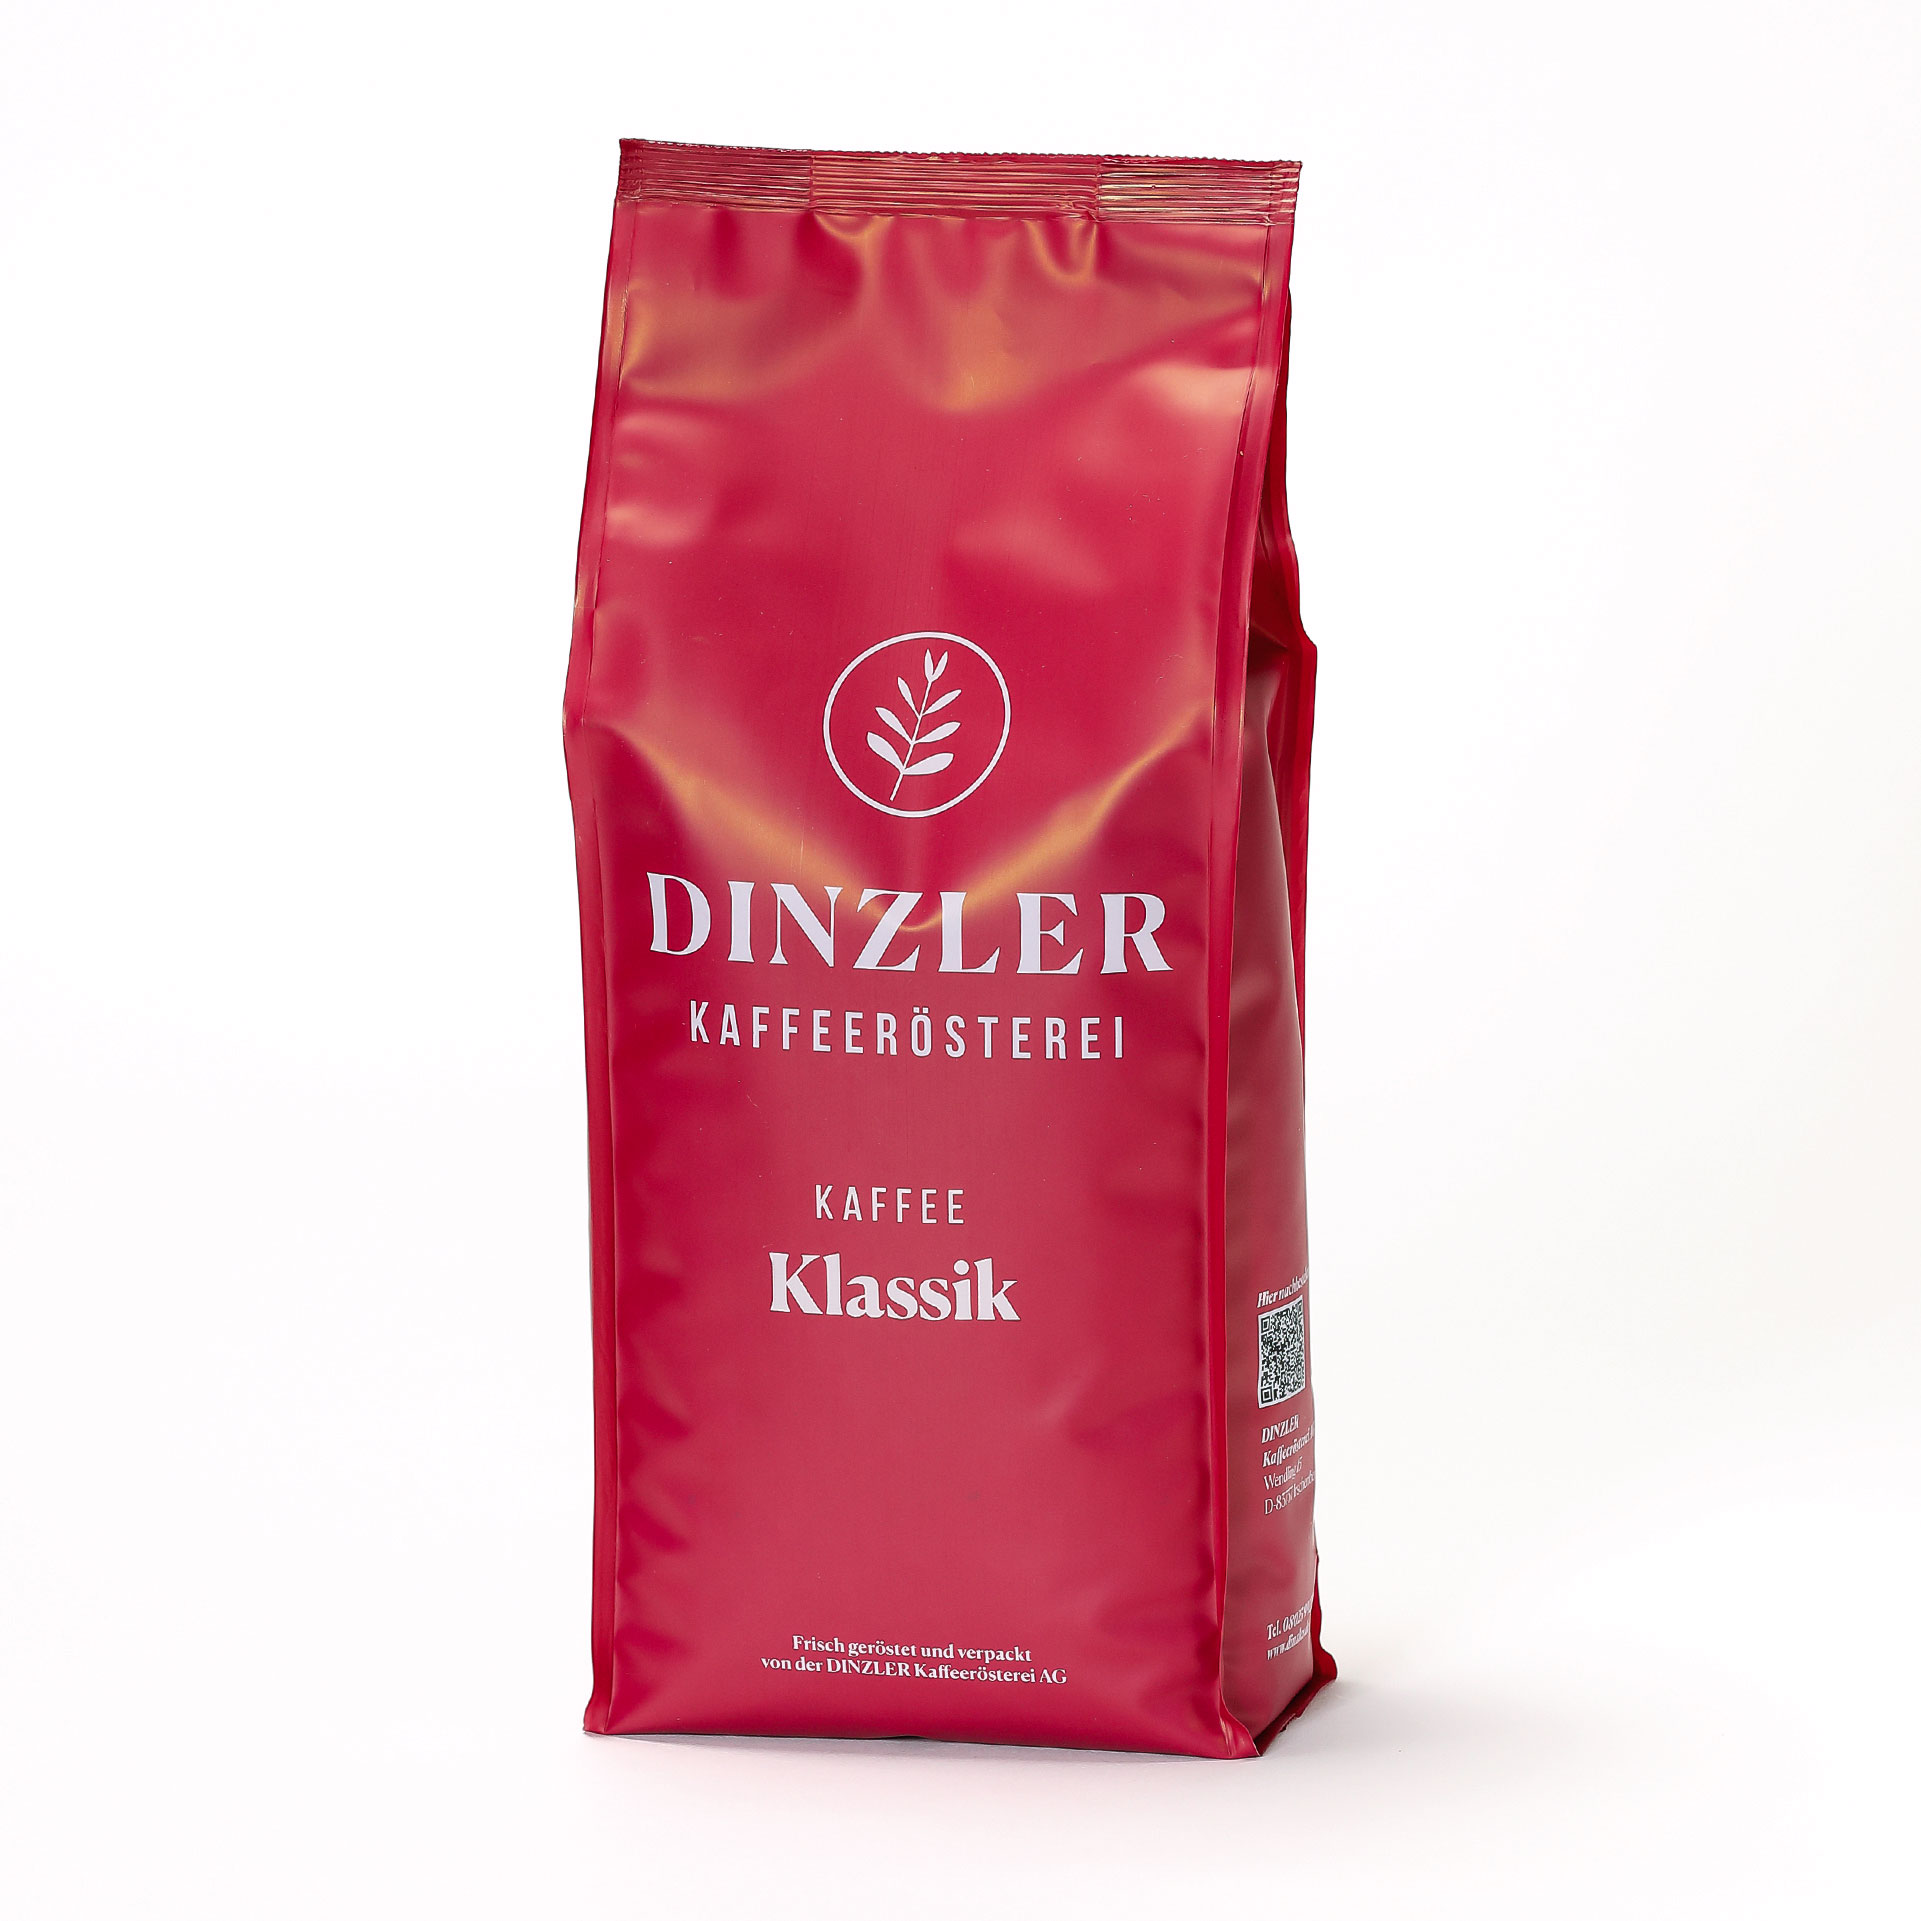 DINZLER Kaffee Klassik